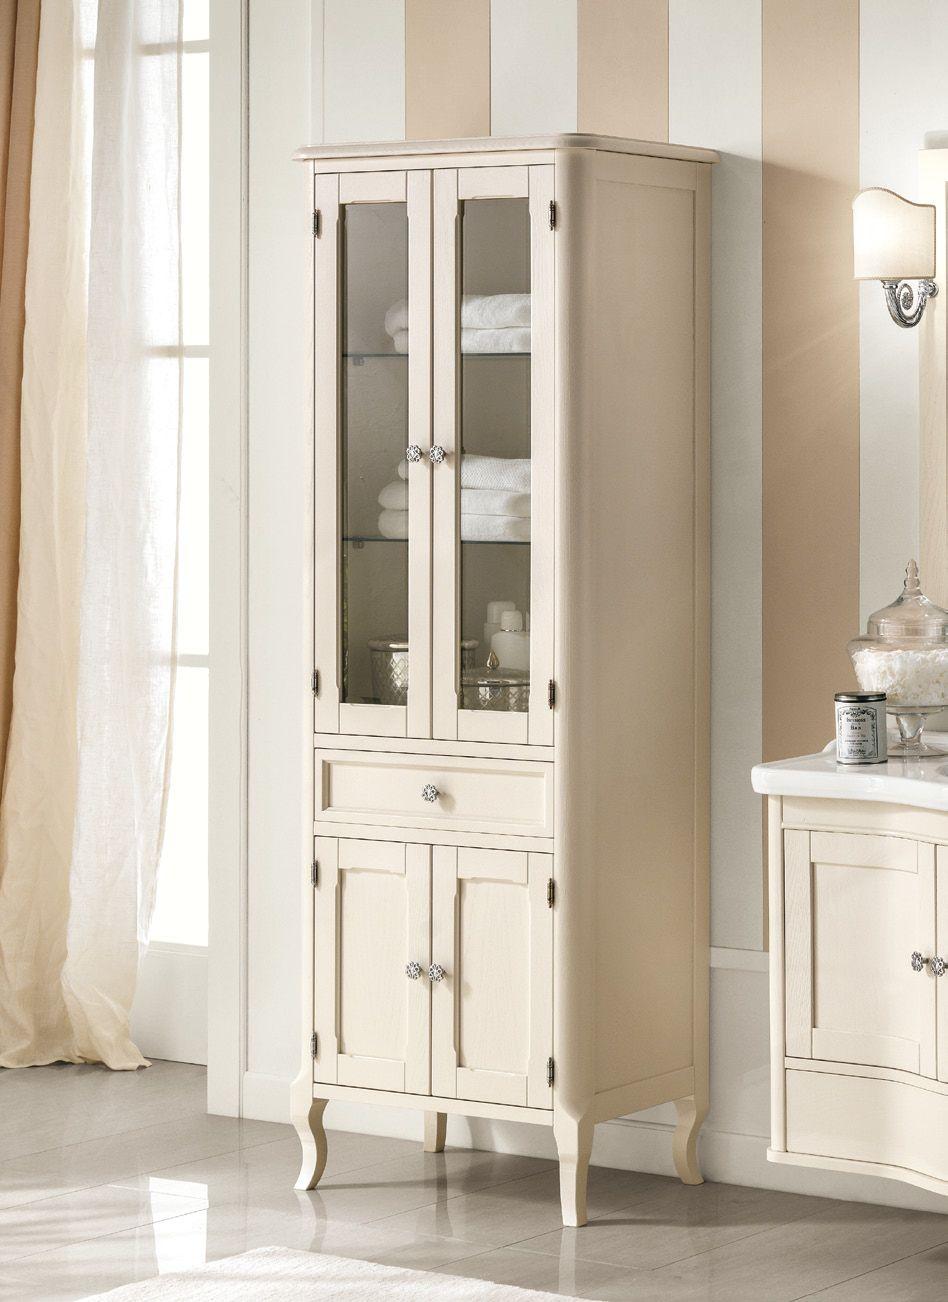 Eban display cabinet Sabrina | #Holz | im Angebot auf #bad39.de ...